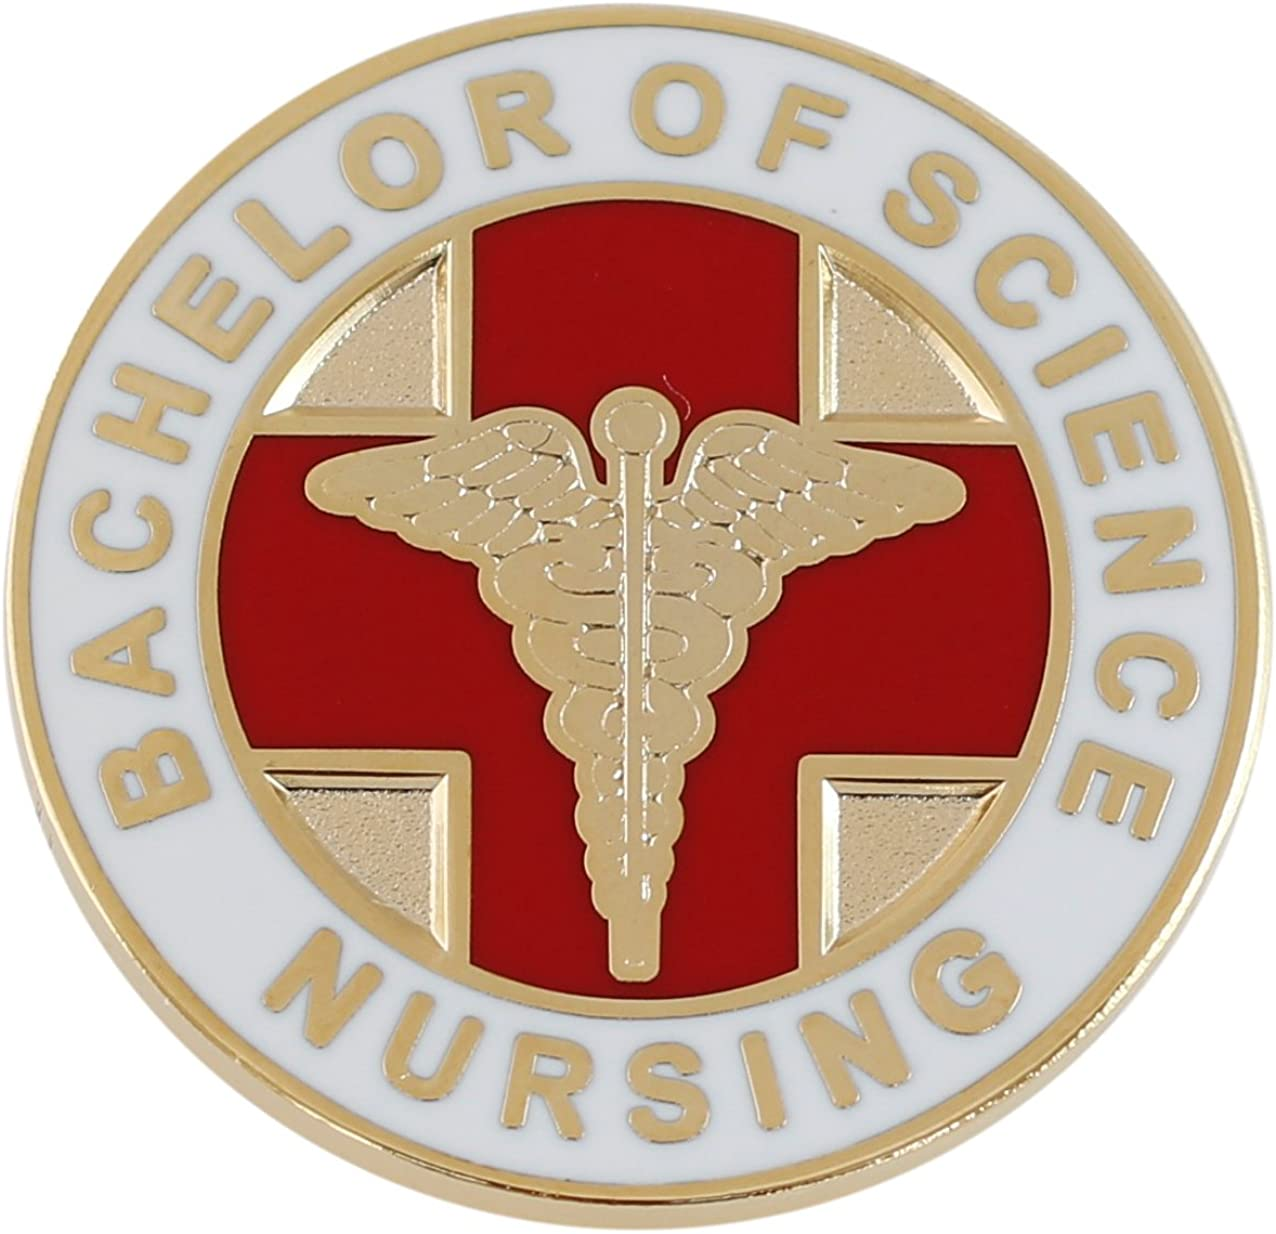 Forge Bachelor of Science Nursing BSN Caduceus Lapel Pin